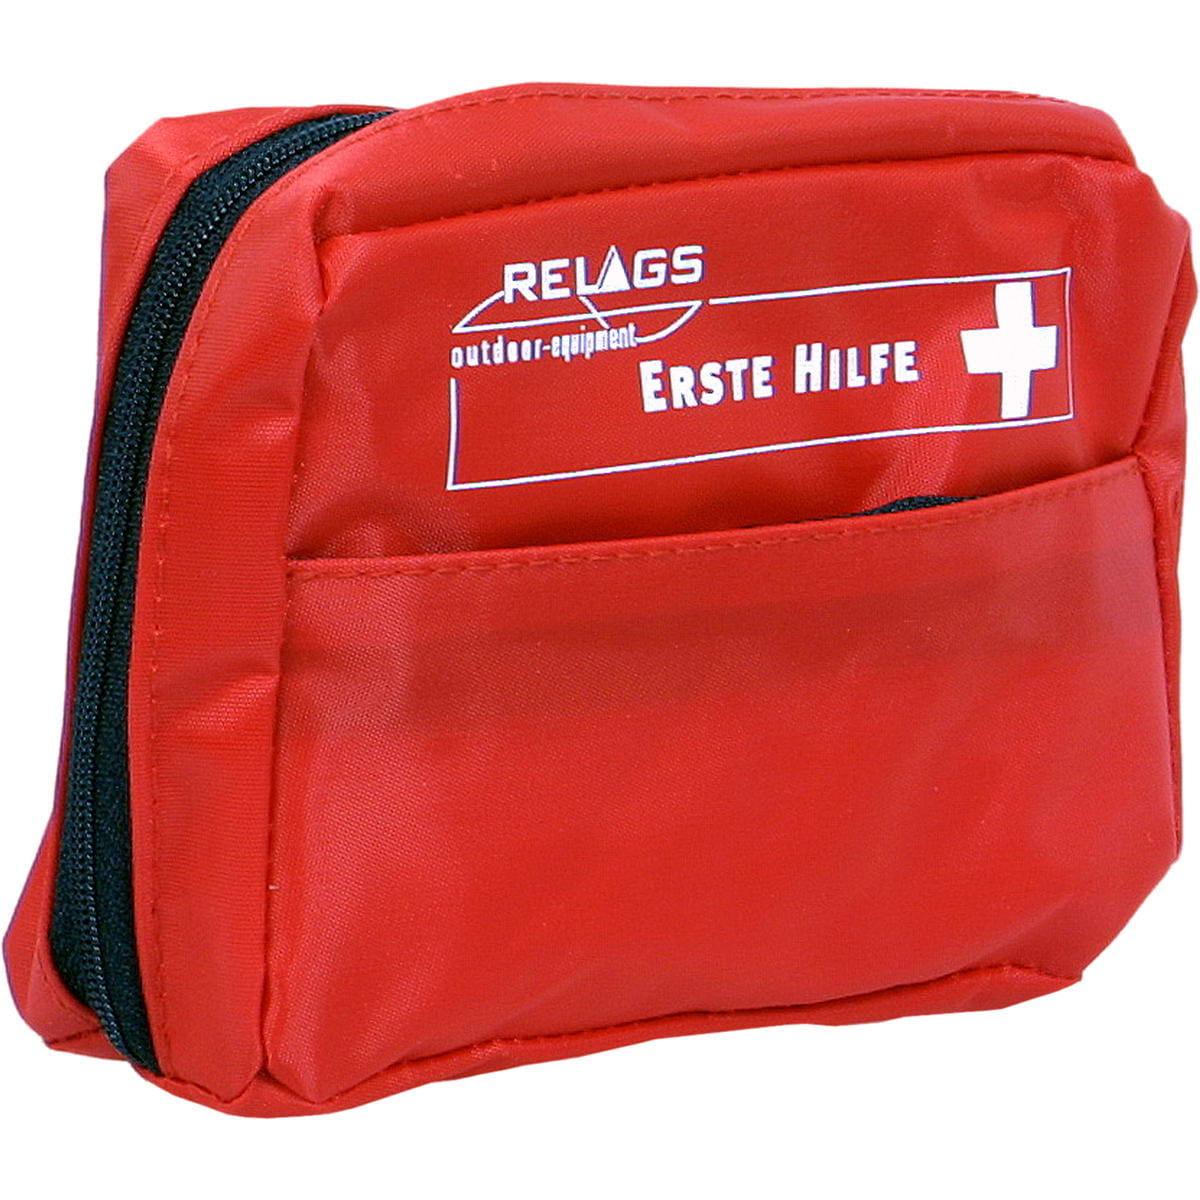 Relags Standard - Erste-Hilfe-Set - Bild 1